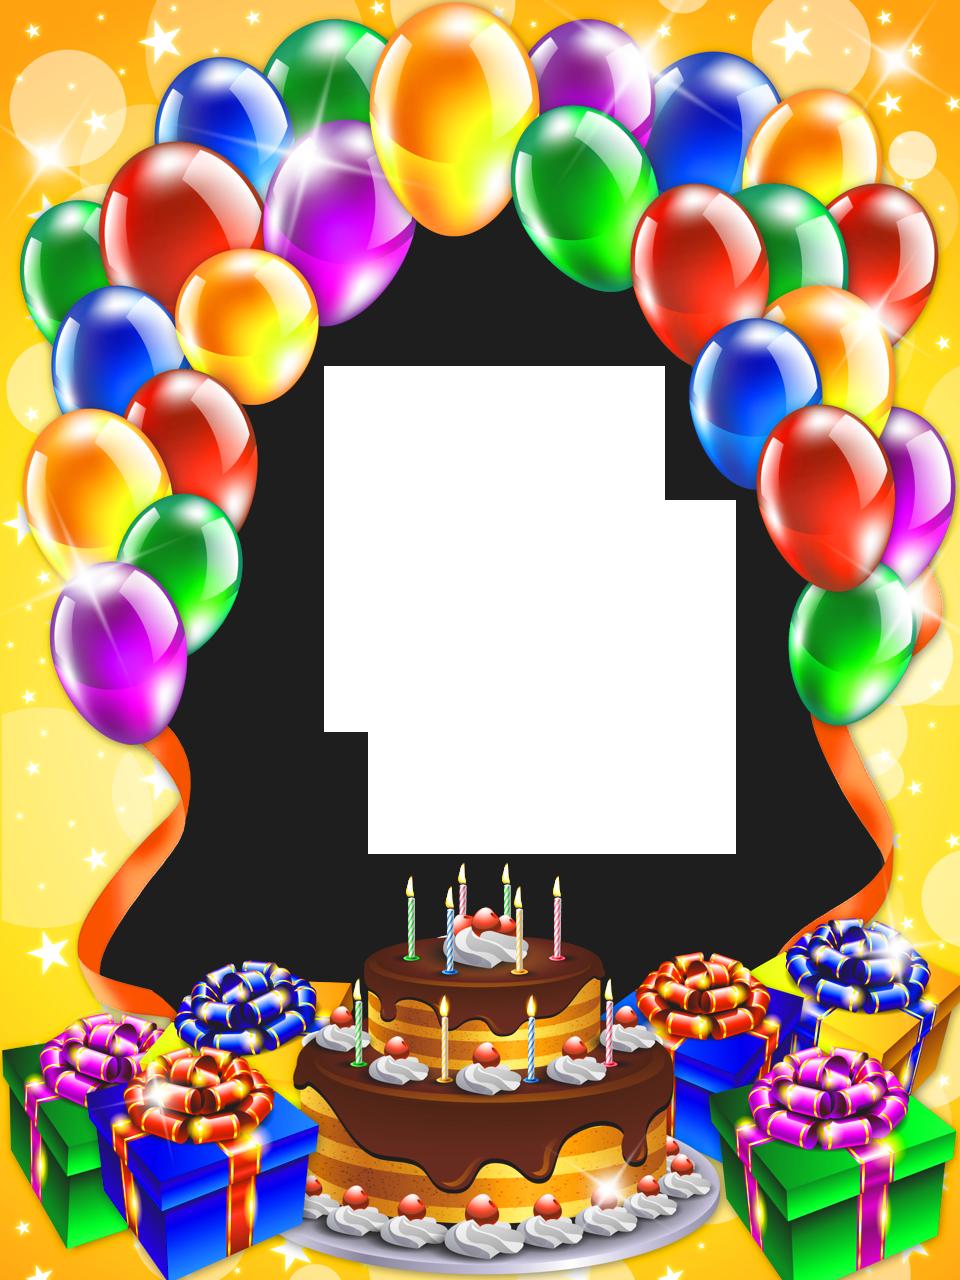 Frame clipart happy birthday Full Yopriceville Frame Birthday Gallery